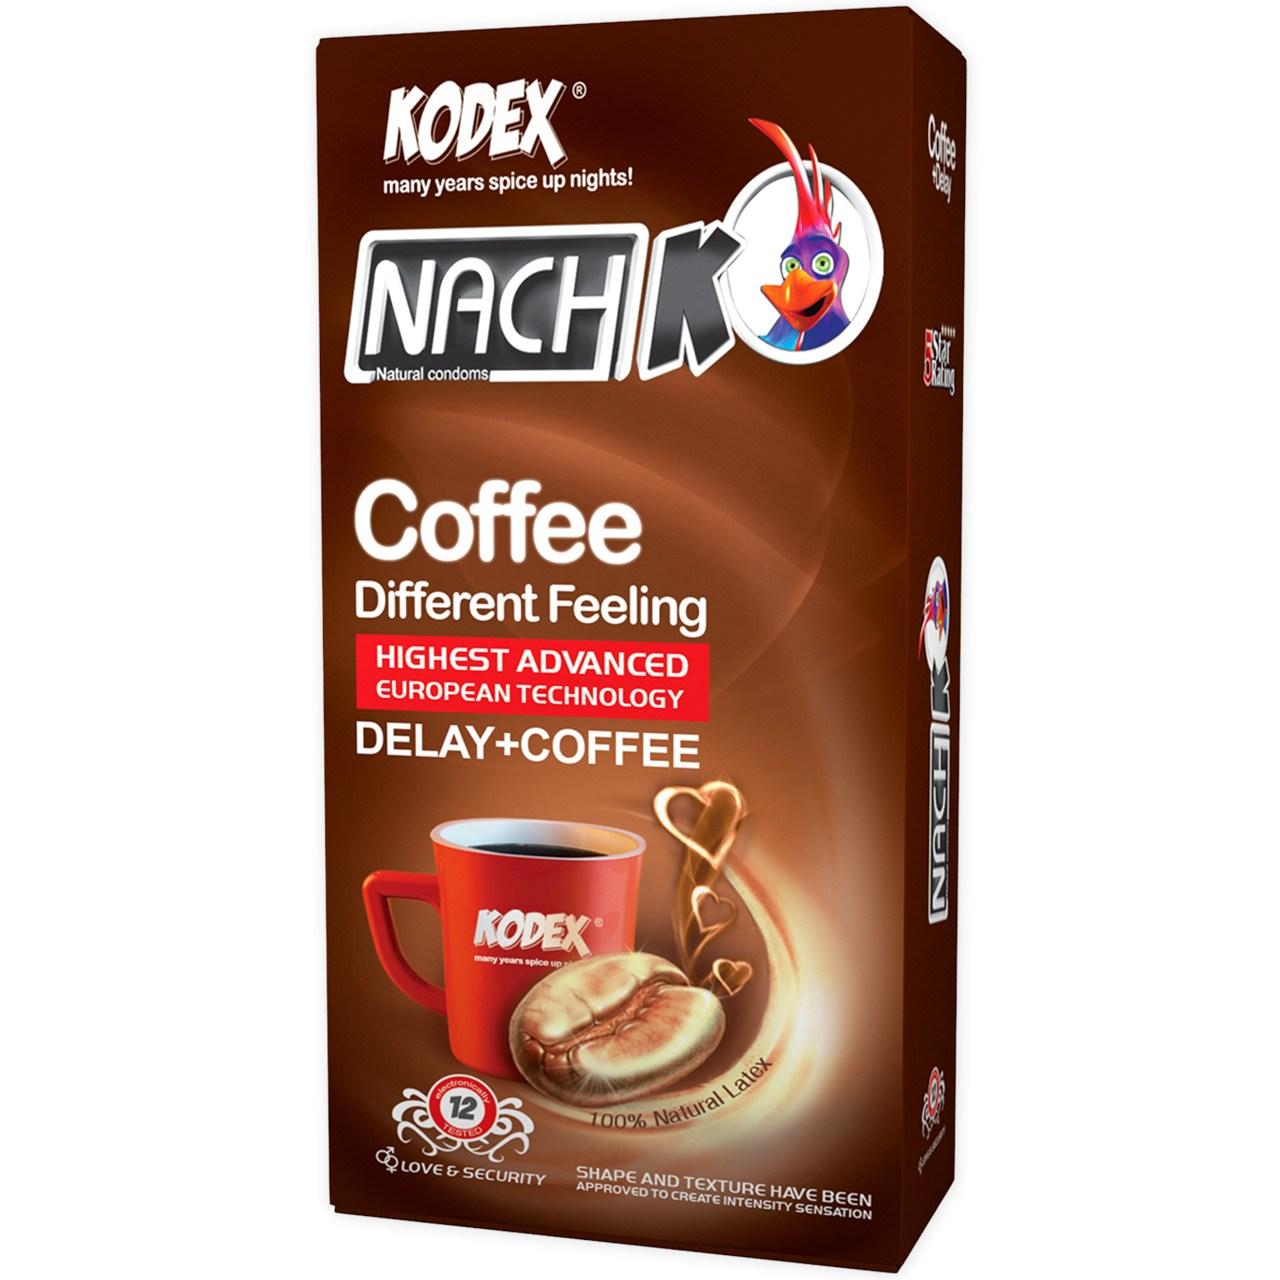 قیمت کاندوم کدکس مدل Coffee بسته 12 عددی